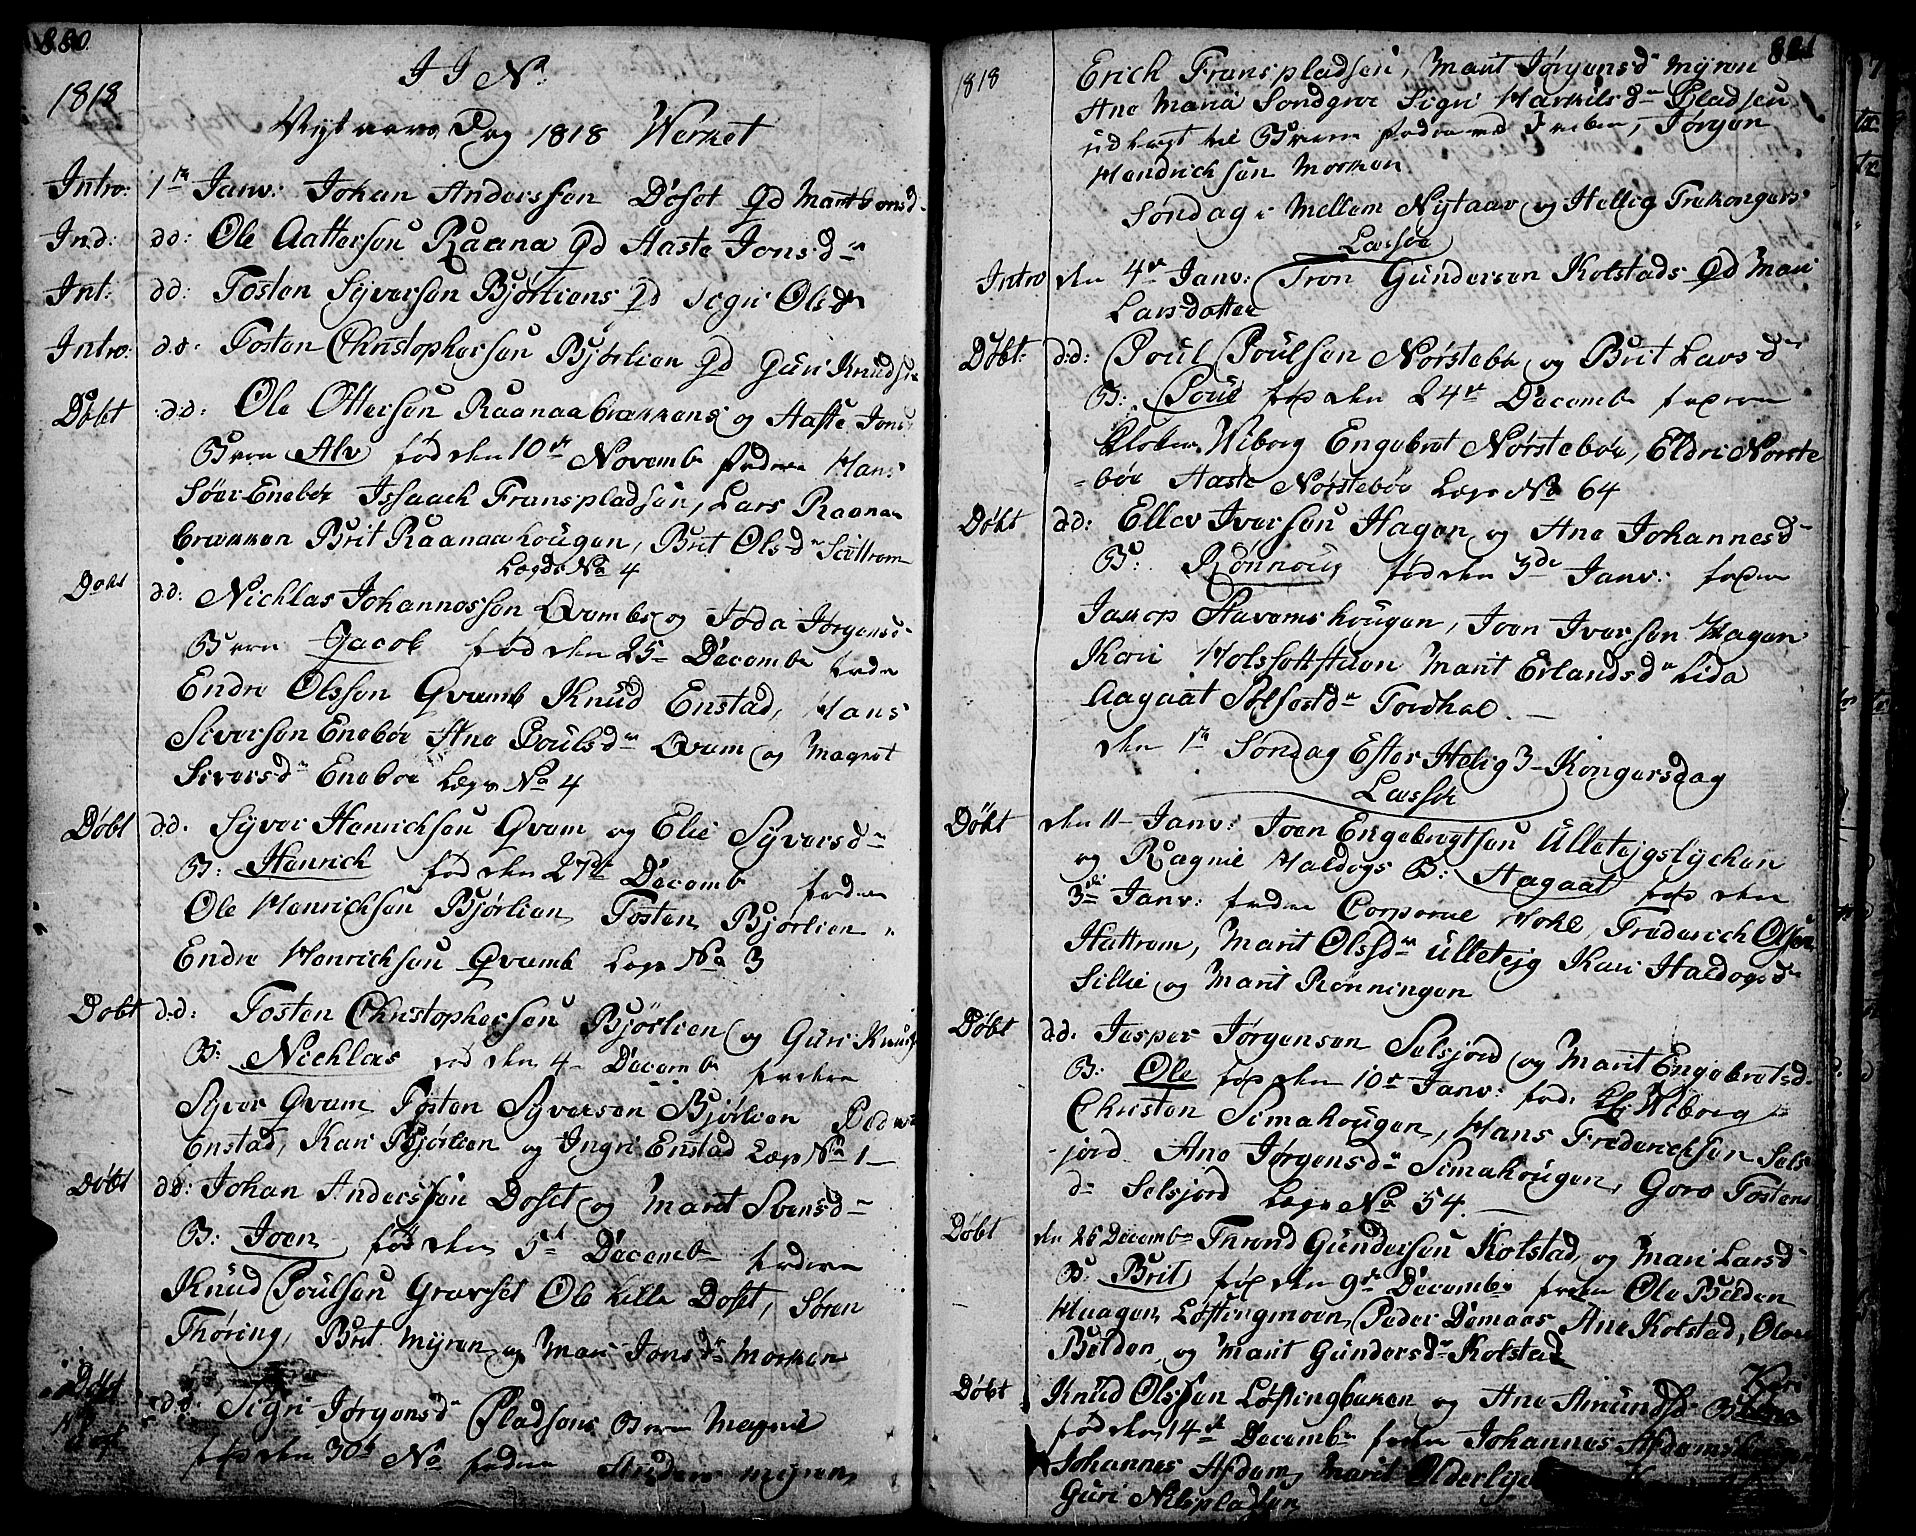 SAH, Lesja prestekontor, Ministerialbok nr. 3, 1777-1819, s. 880-881